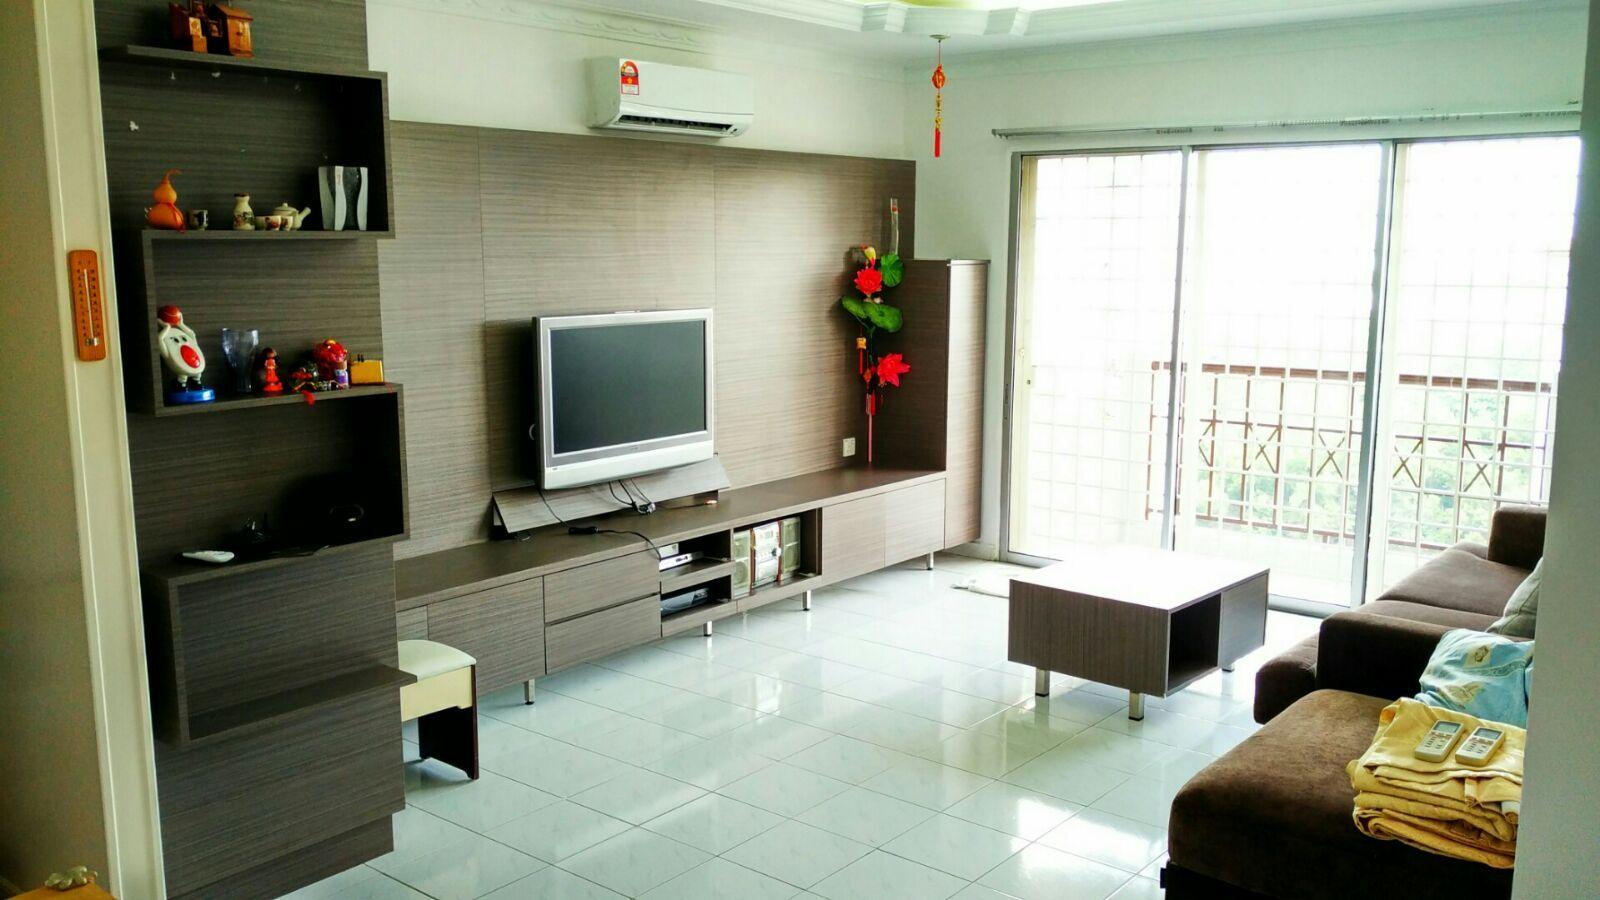 For Sale: Seri Mutiara Apartment Setia Alam 939sf 2CP Location: Setia Alam, Selangor Type: Apartment/Flat Price: RM380000 Size: 939 sqft  Jimmy 0163606237